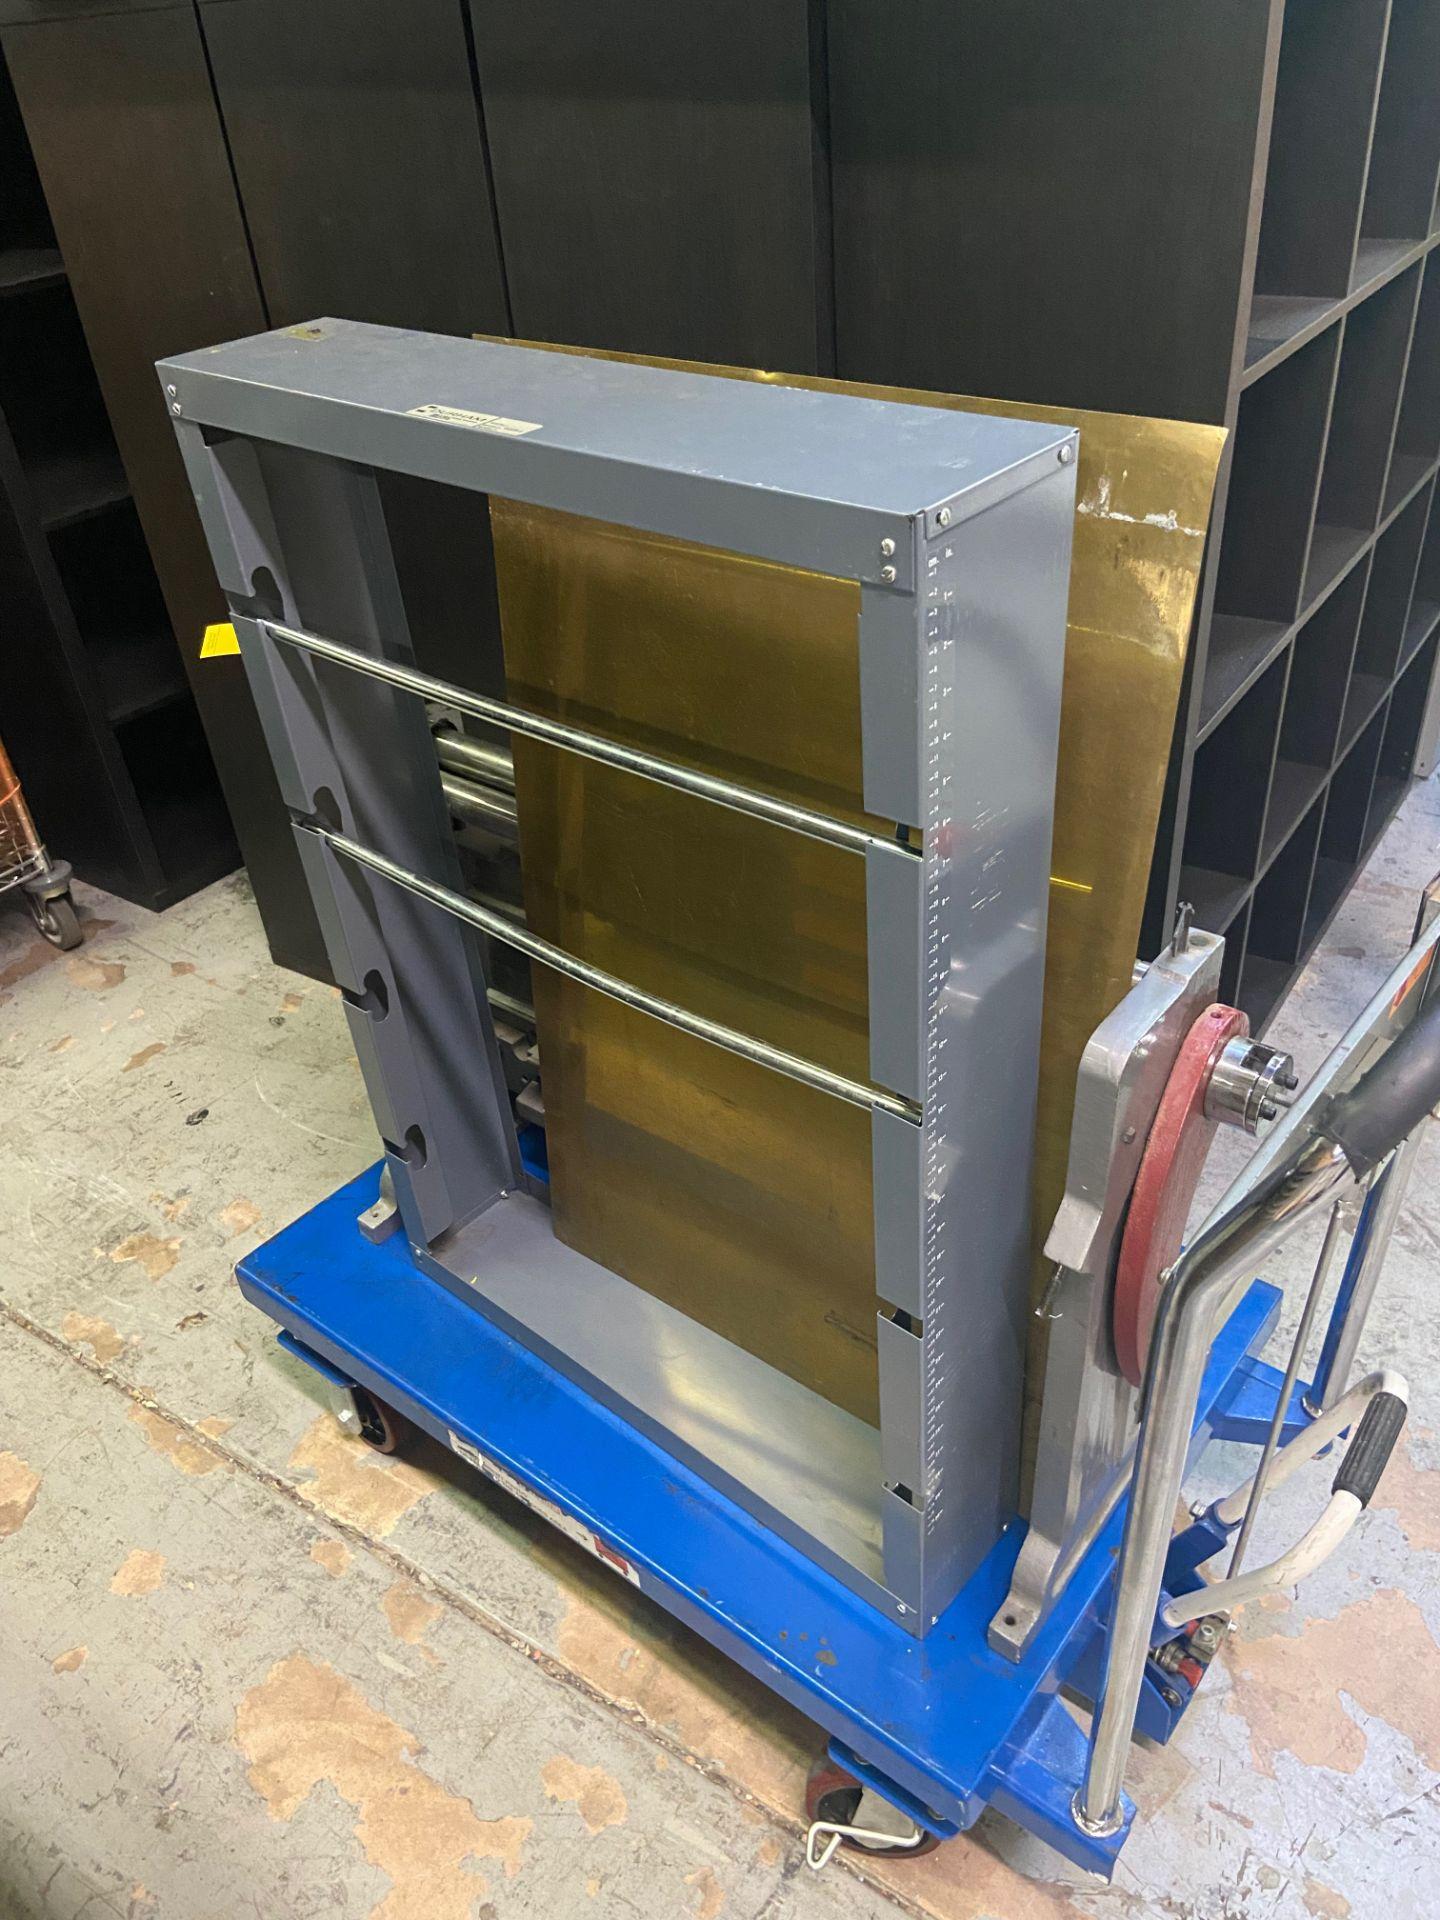 Durham Sheet Metal Brake/Bender, Model# WSR-4, Loading/Removal Fee: $20 - Image 2 of 5